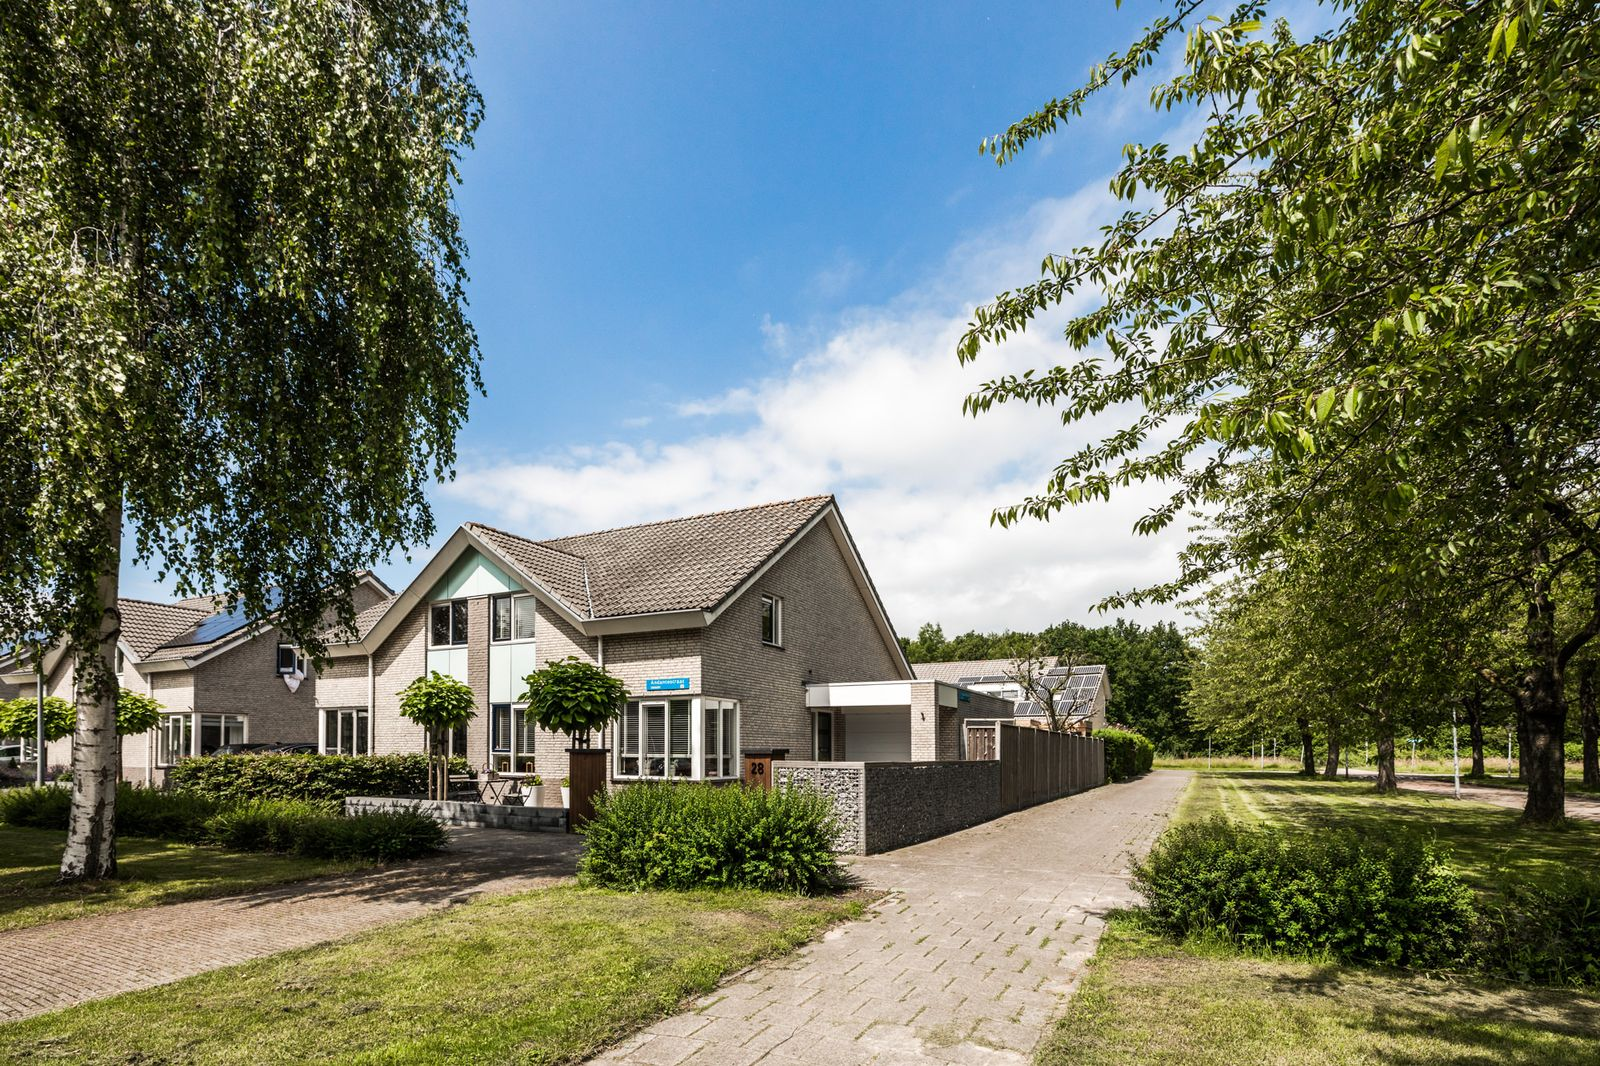 Andantestraat 28, Almere